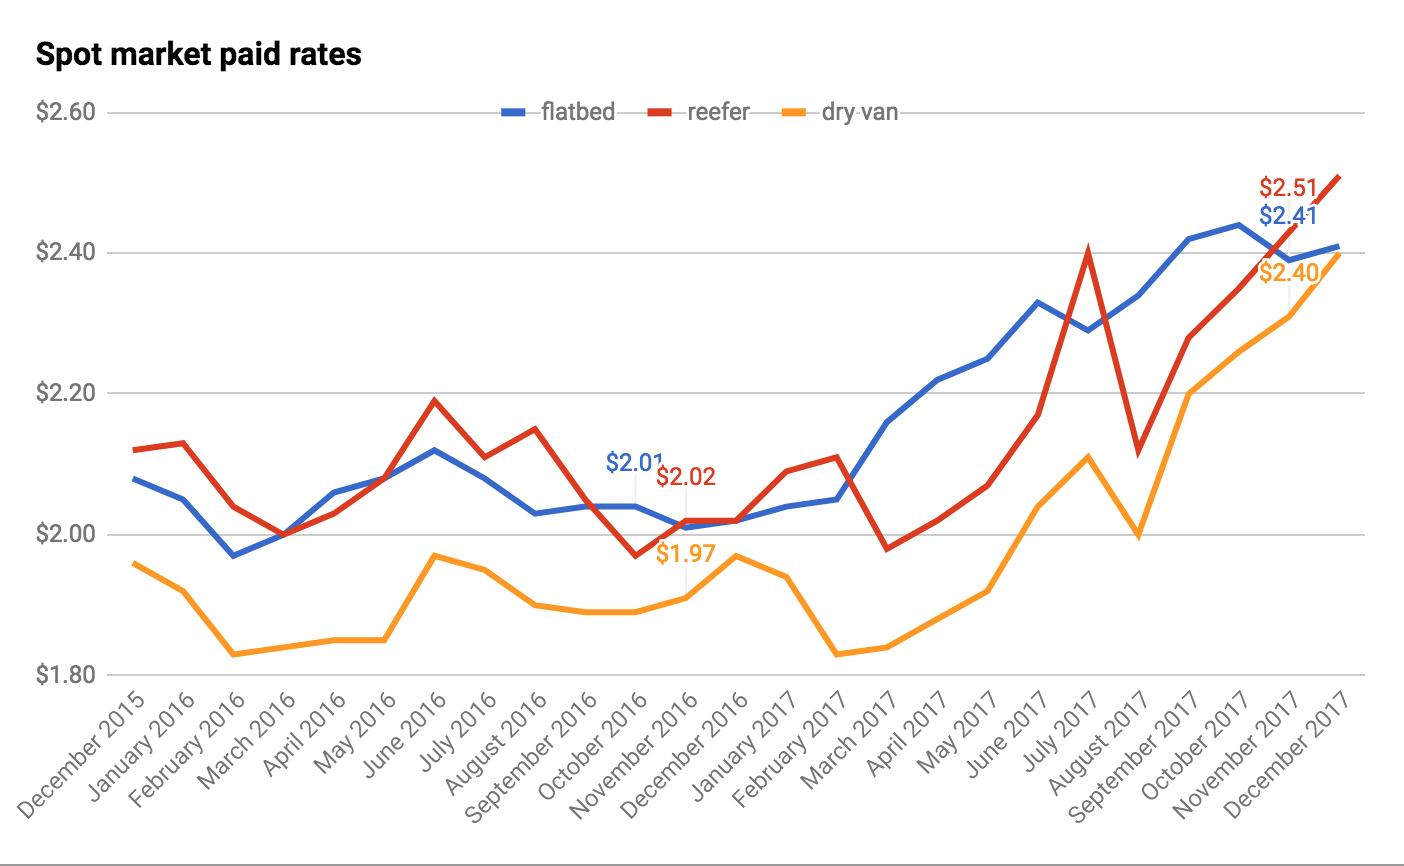 Spot Market Paid Rates